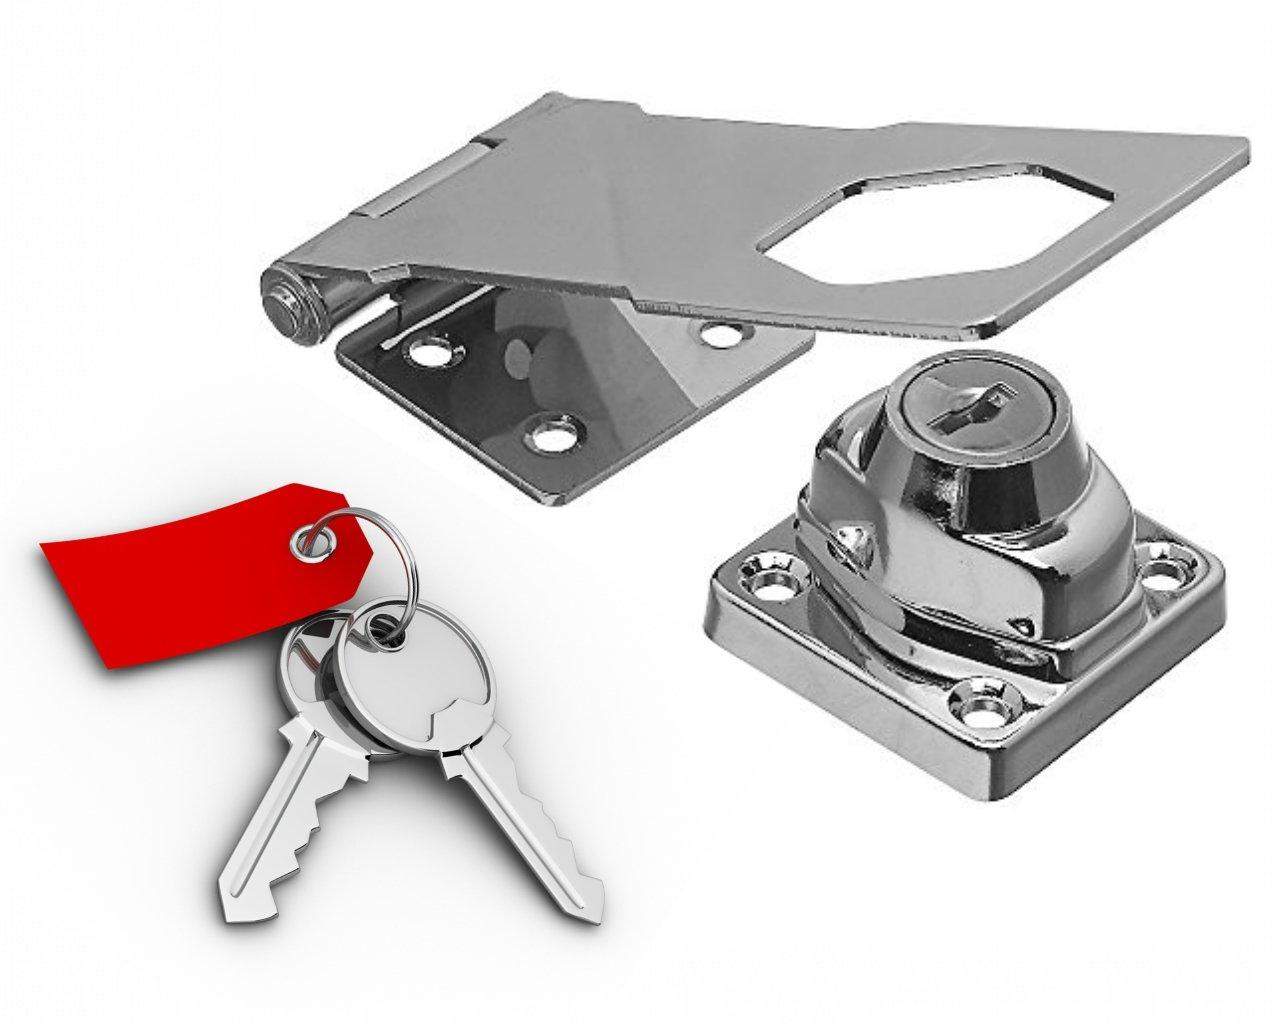 Keyed Hasp Lock : 4 1/2'' With Twist Knob : Keyed Alike : Chrome Plated Steel Metal : Uses Yale Keyway by T-Locks